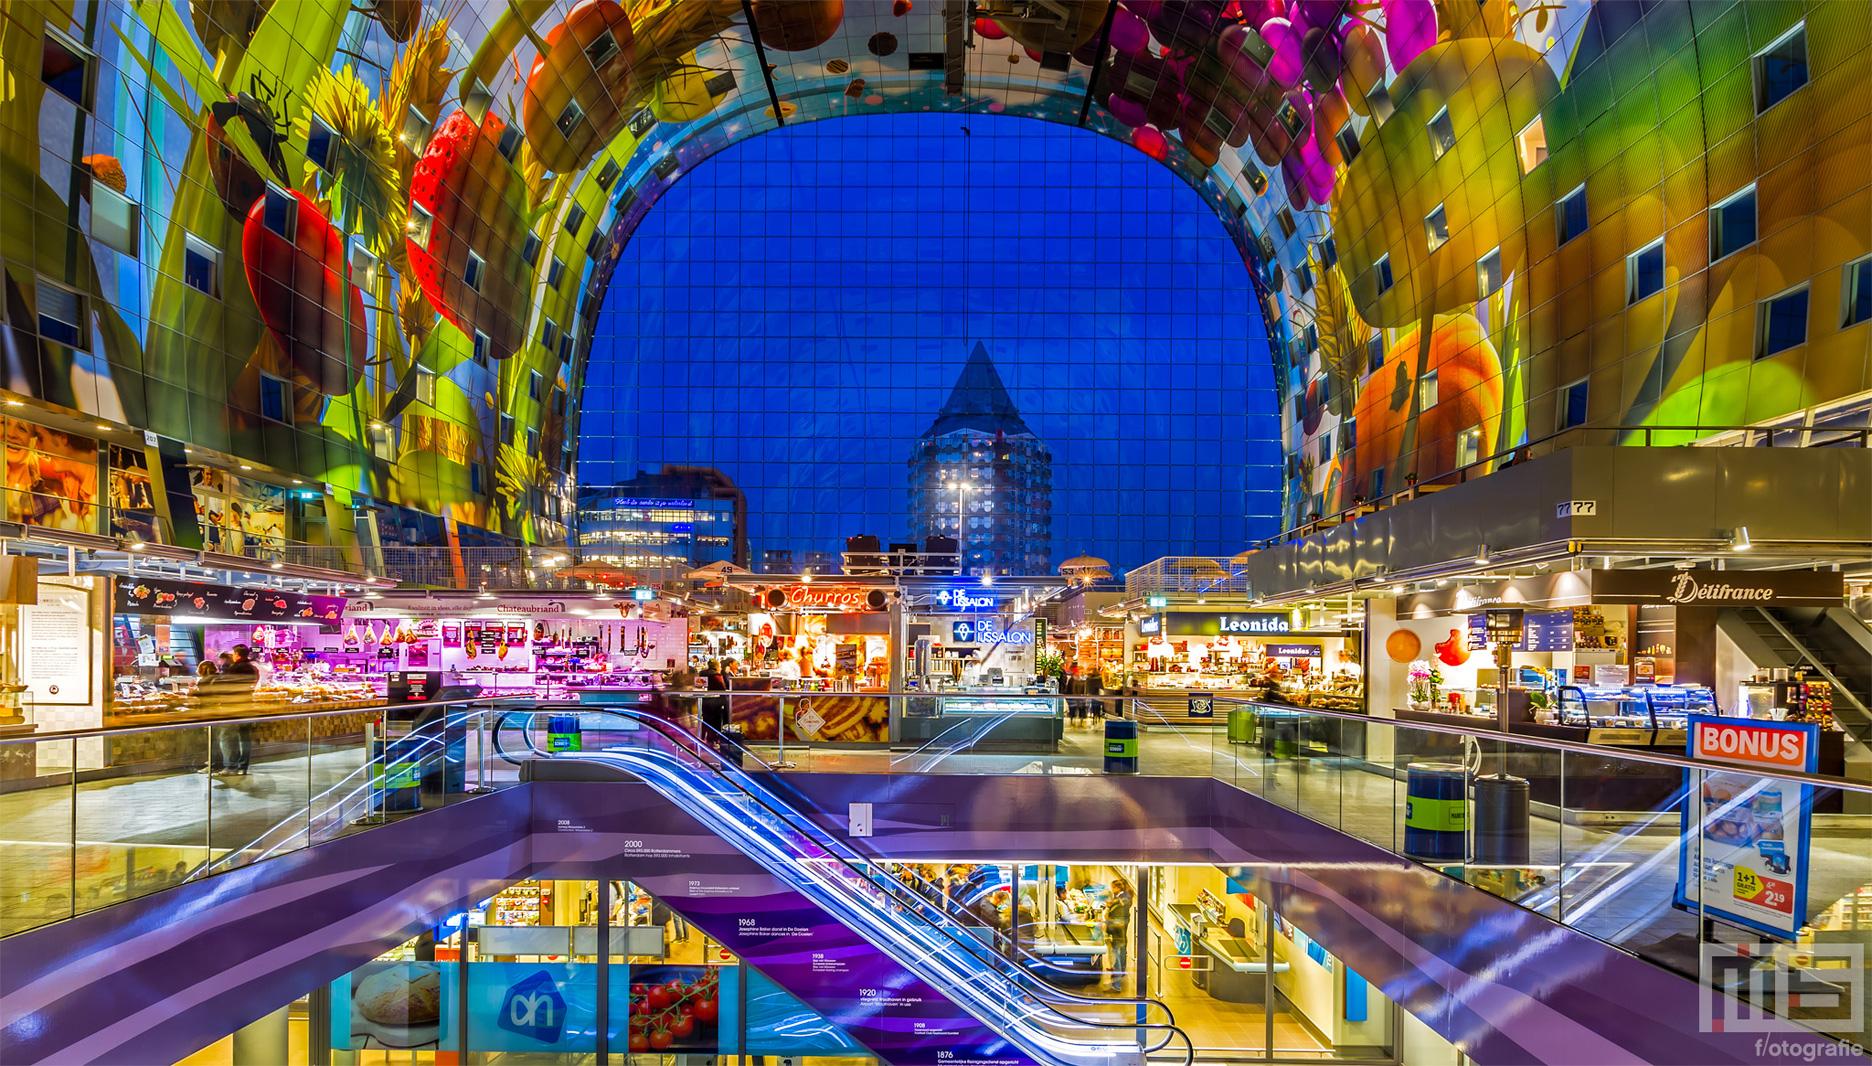 MS Fotografie doet mee aan Black Friday Rotterdam 2017